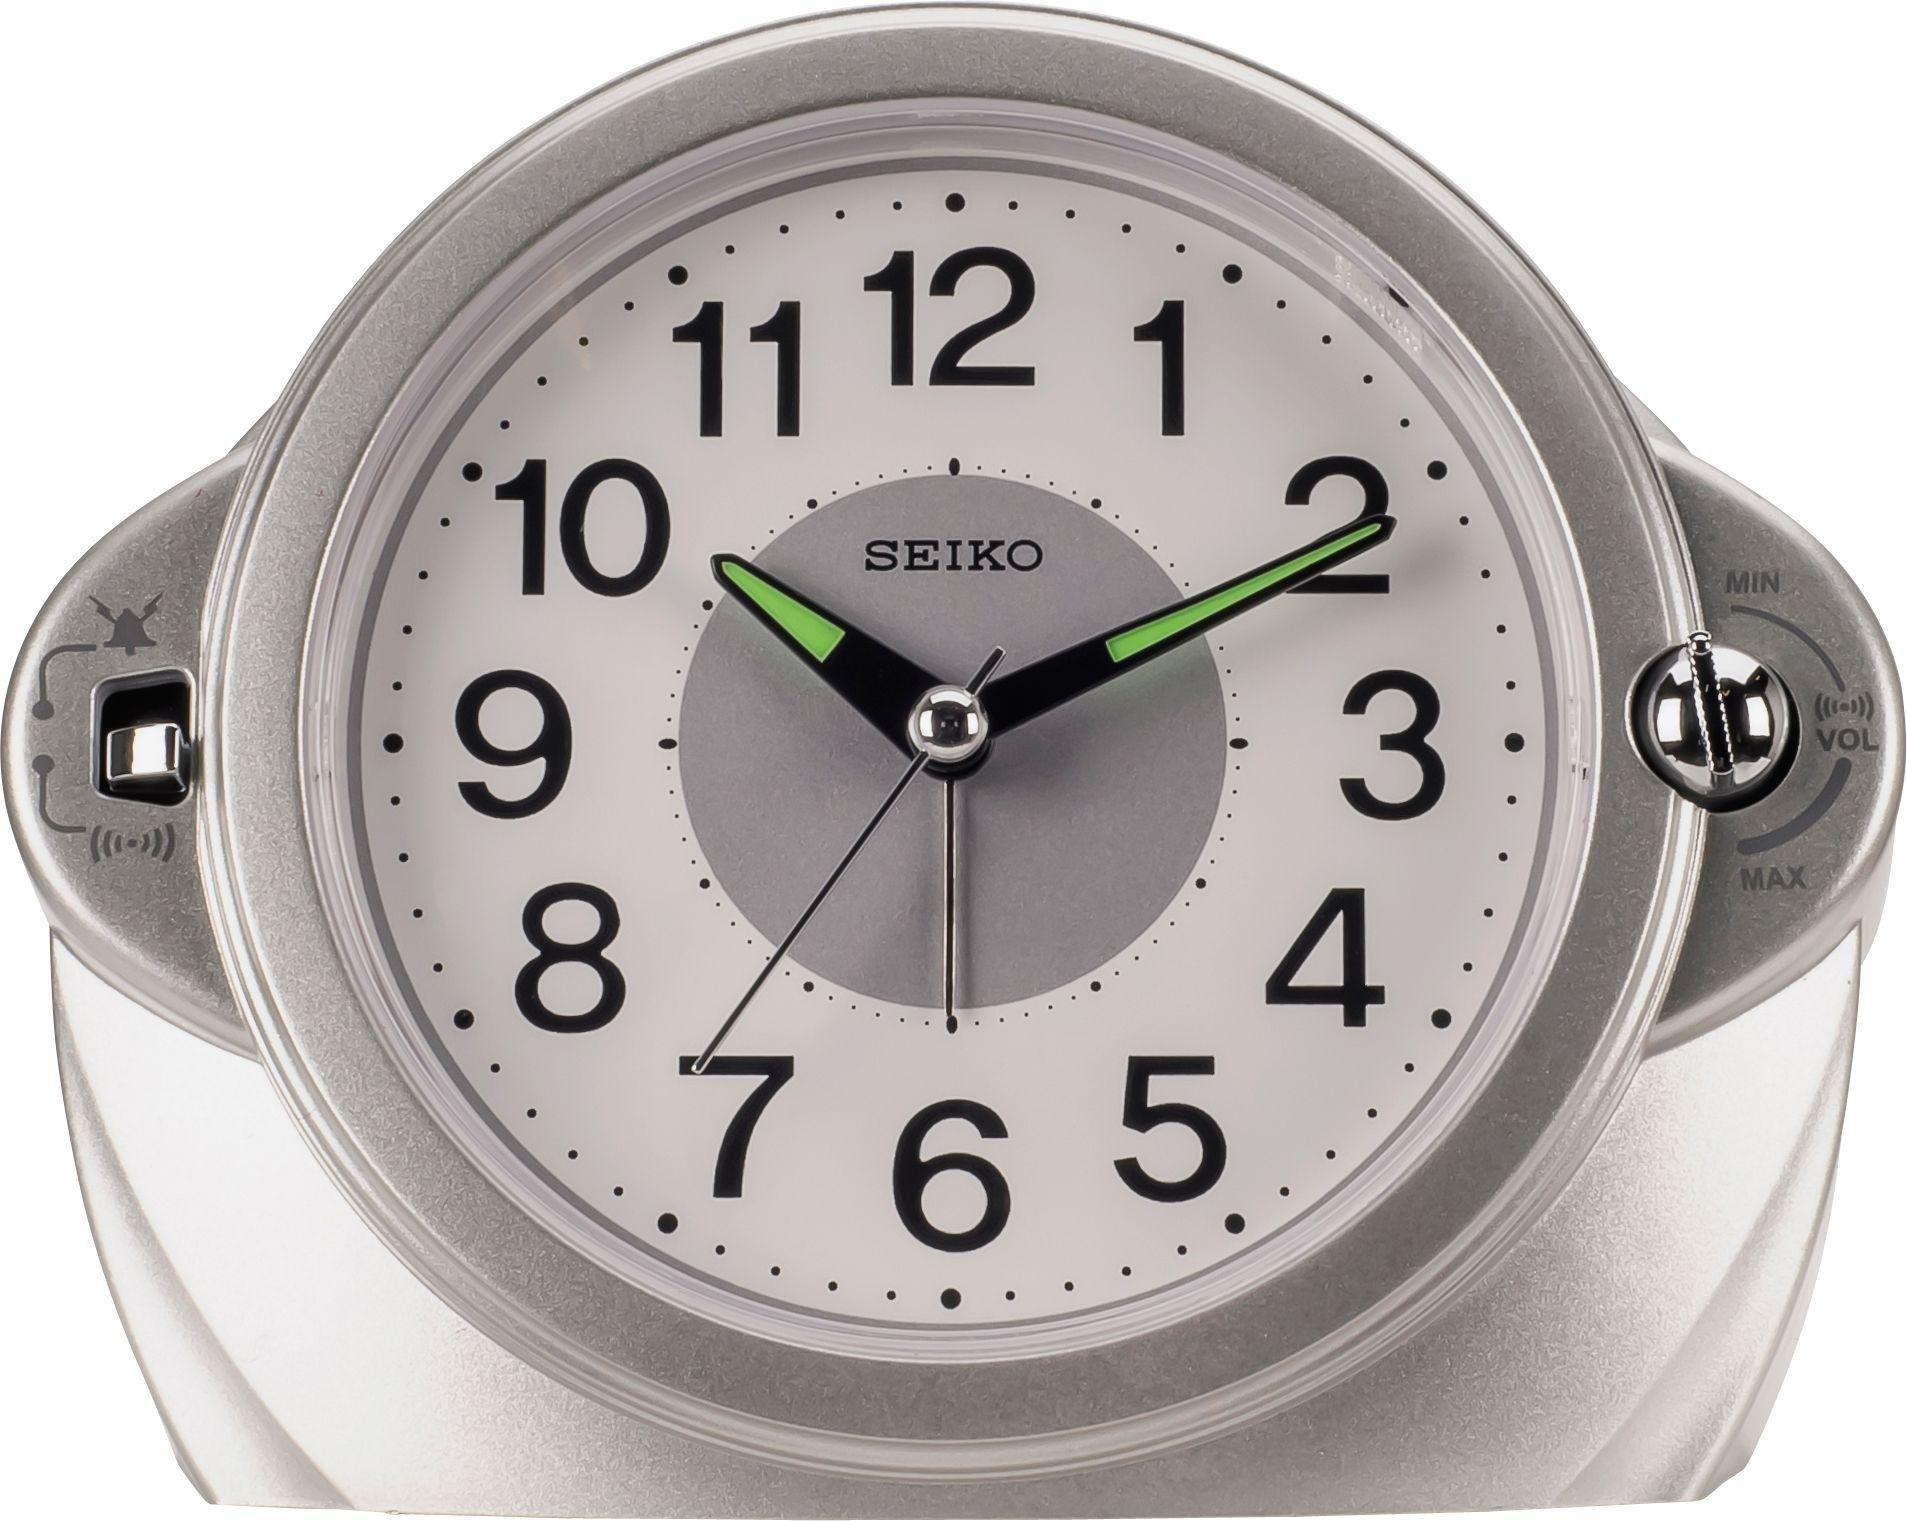 Seiko Volume Control Sweeper Alarm Clock £6.60 @ Argos